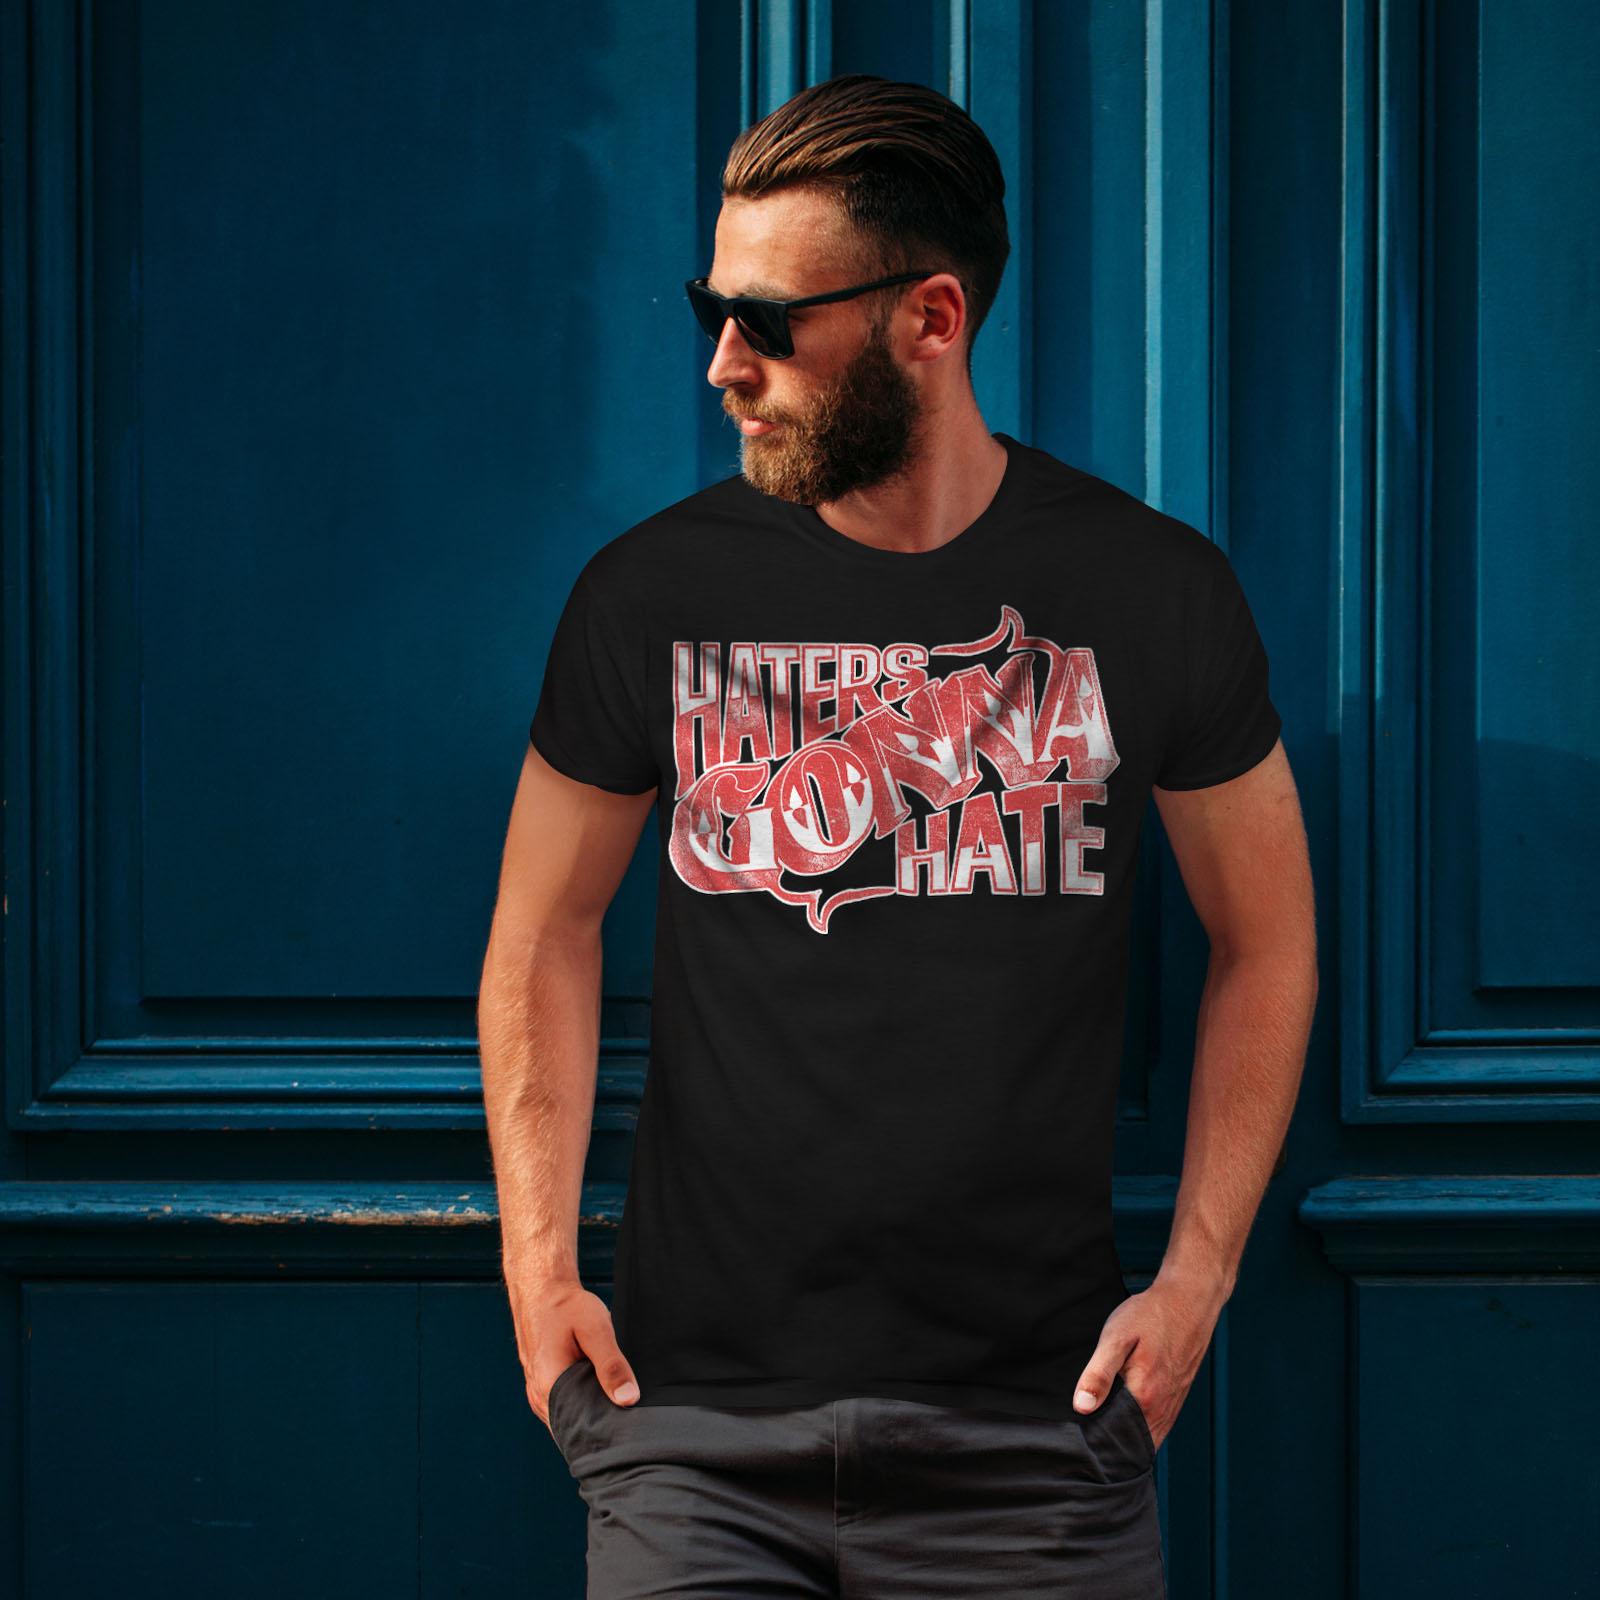 Wellcoda-Wasser-hassen-Zitat-Slogan-Herren-T-Shirt-True-Grafikdesign-Printed-Tee Indexbild 4